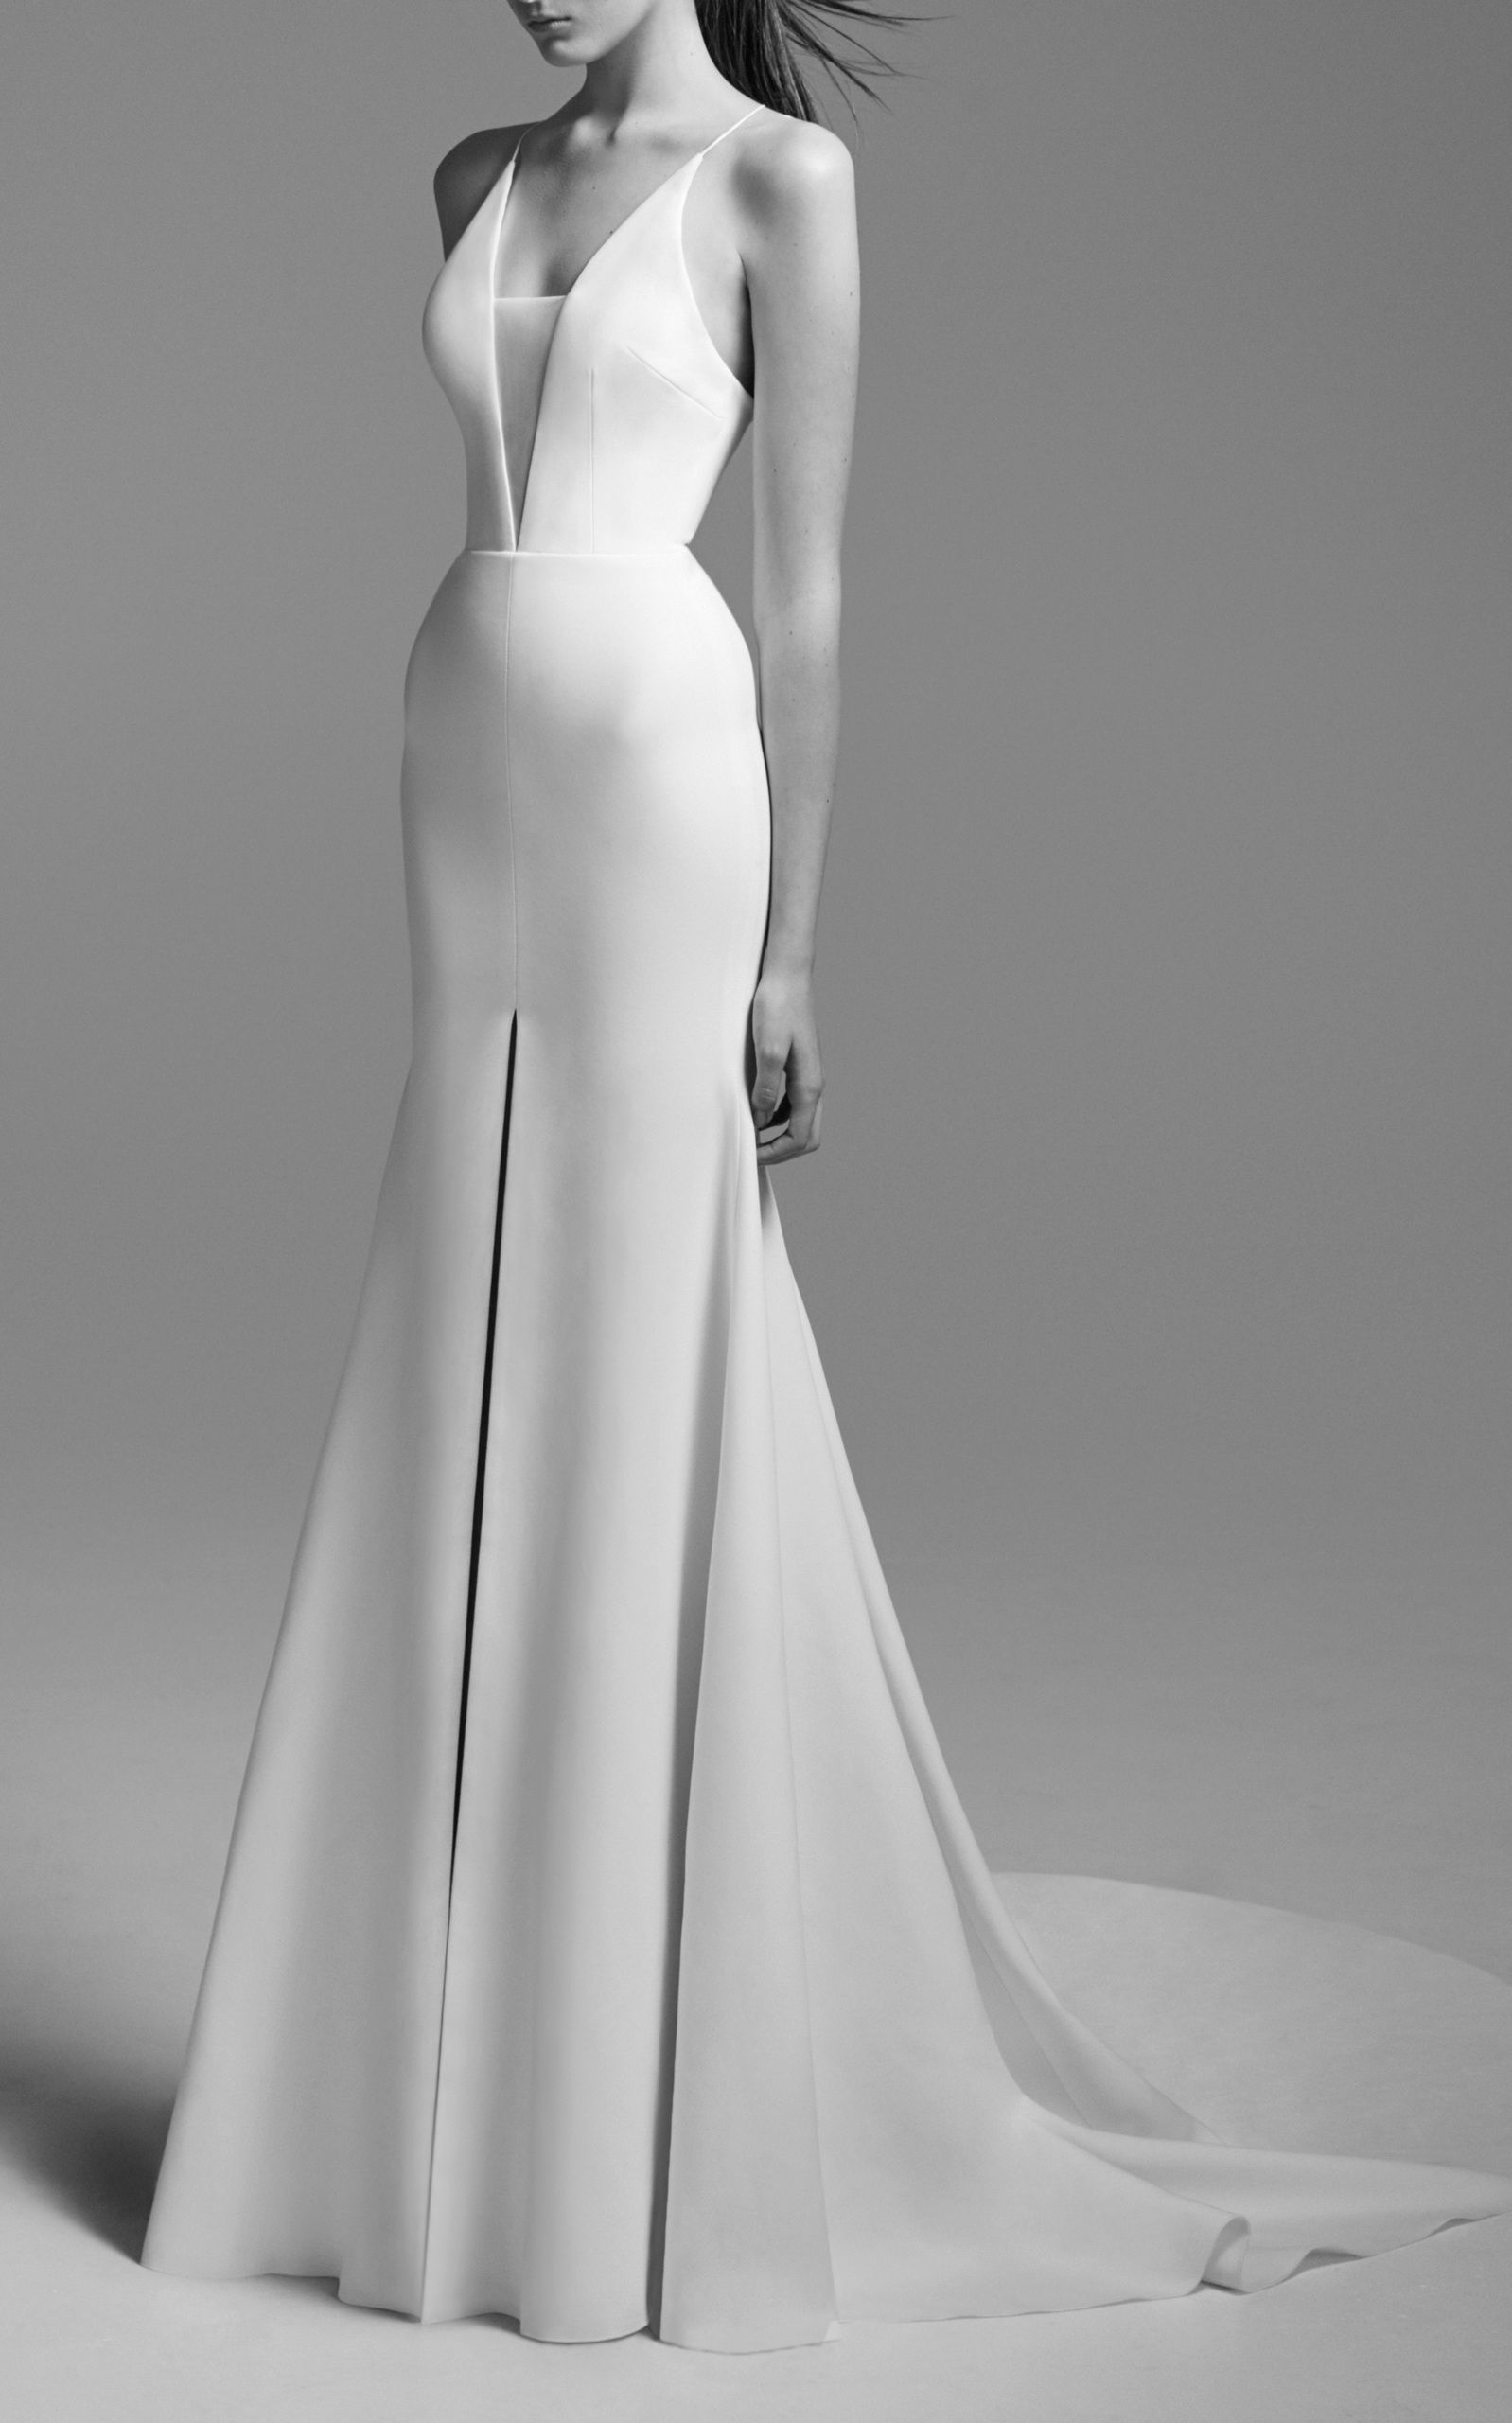 Modern Luxury Wedding Dresses | Alex Perry Bride - KnotsVilla